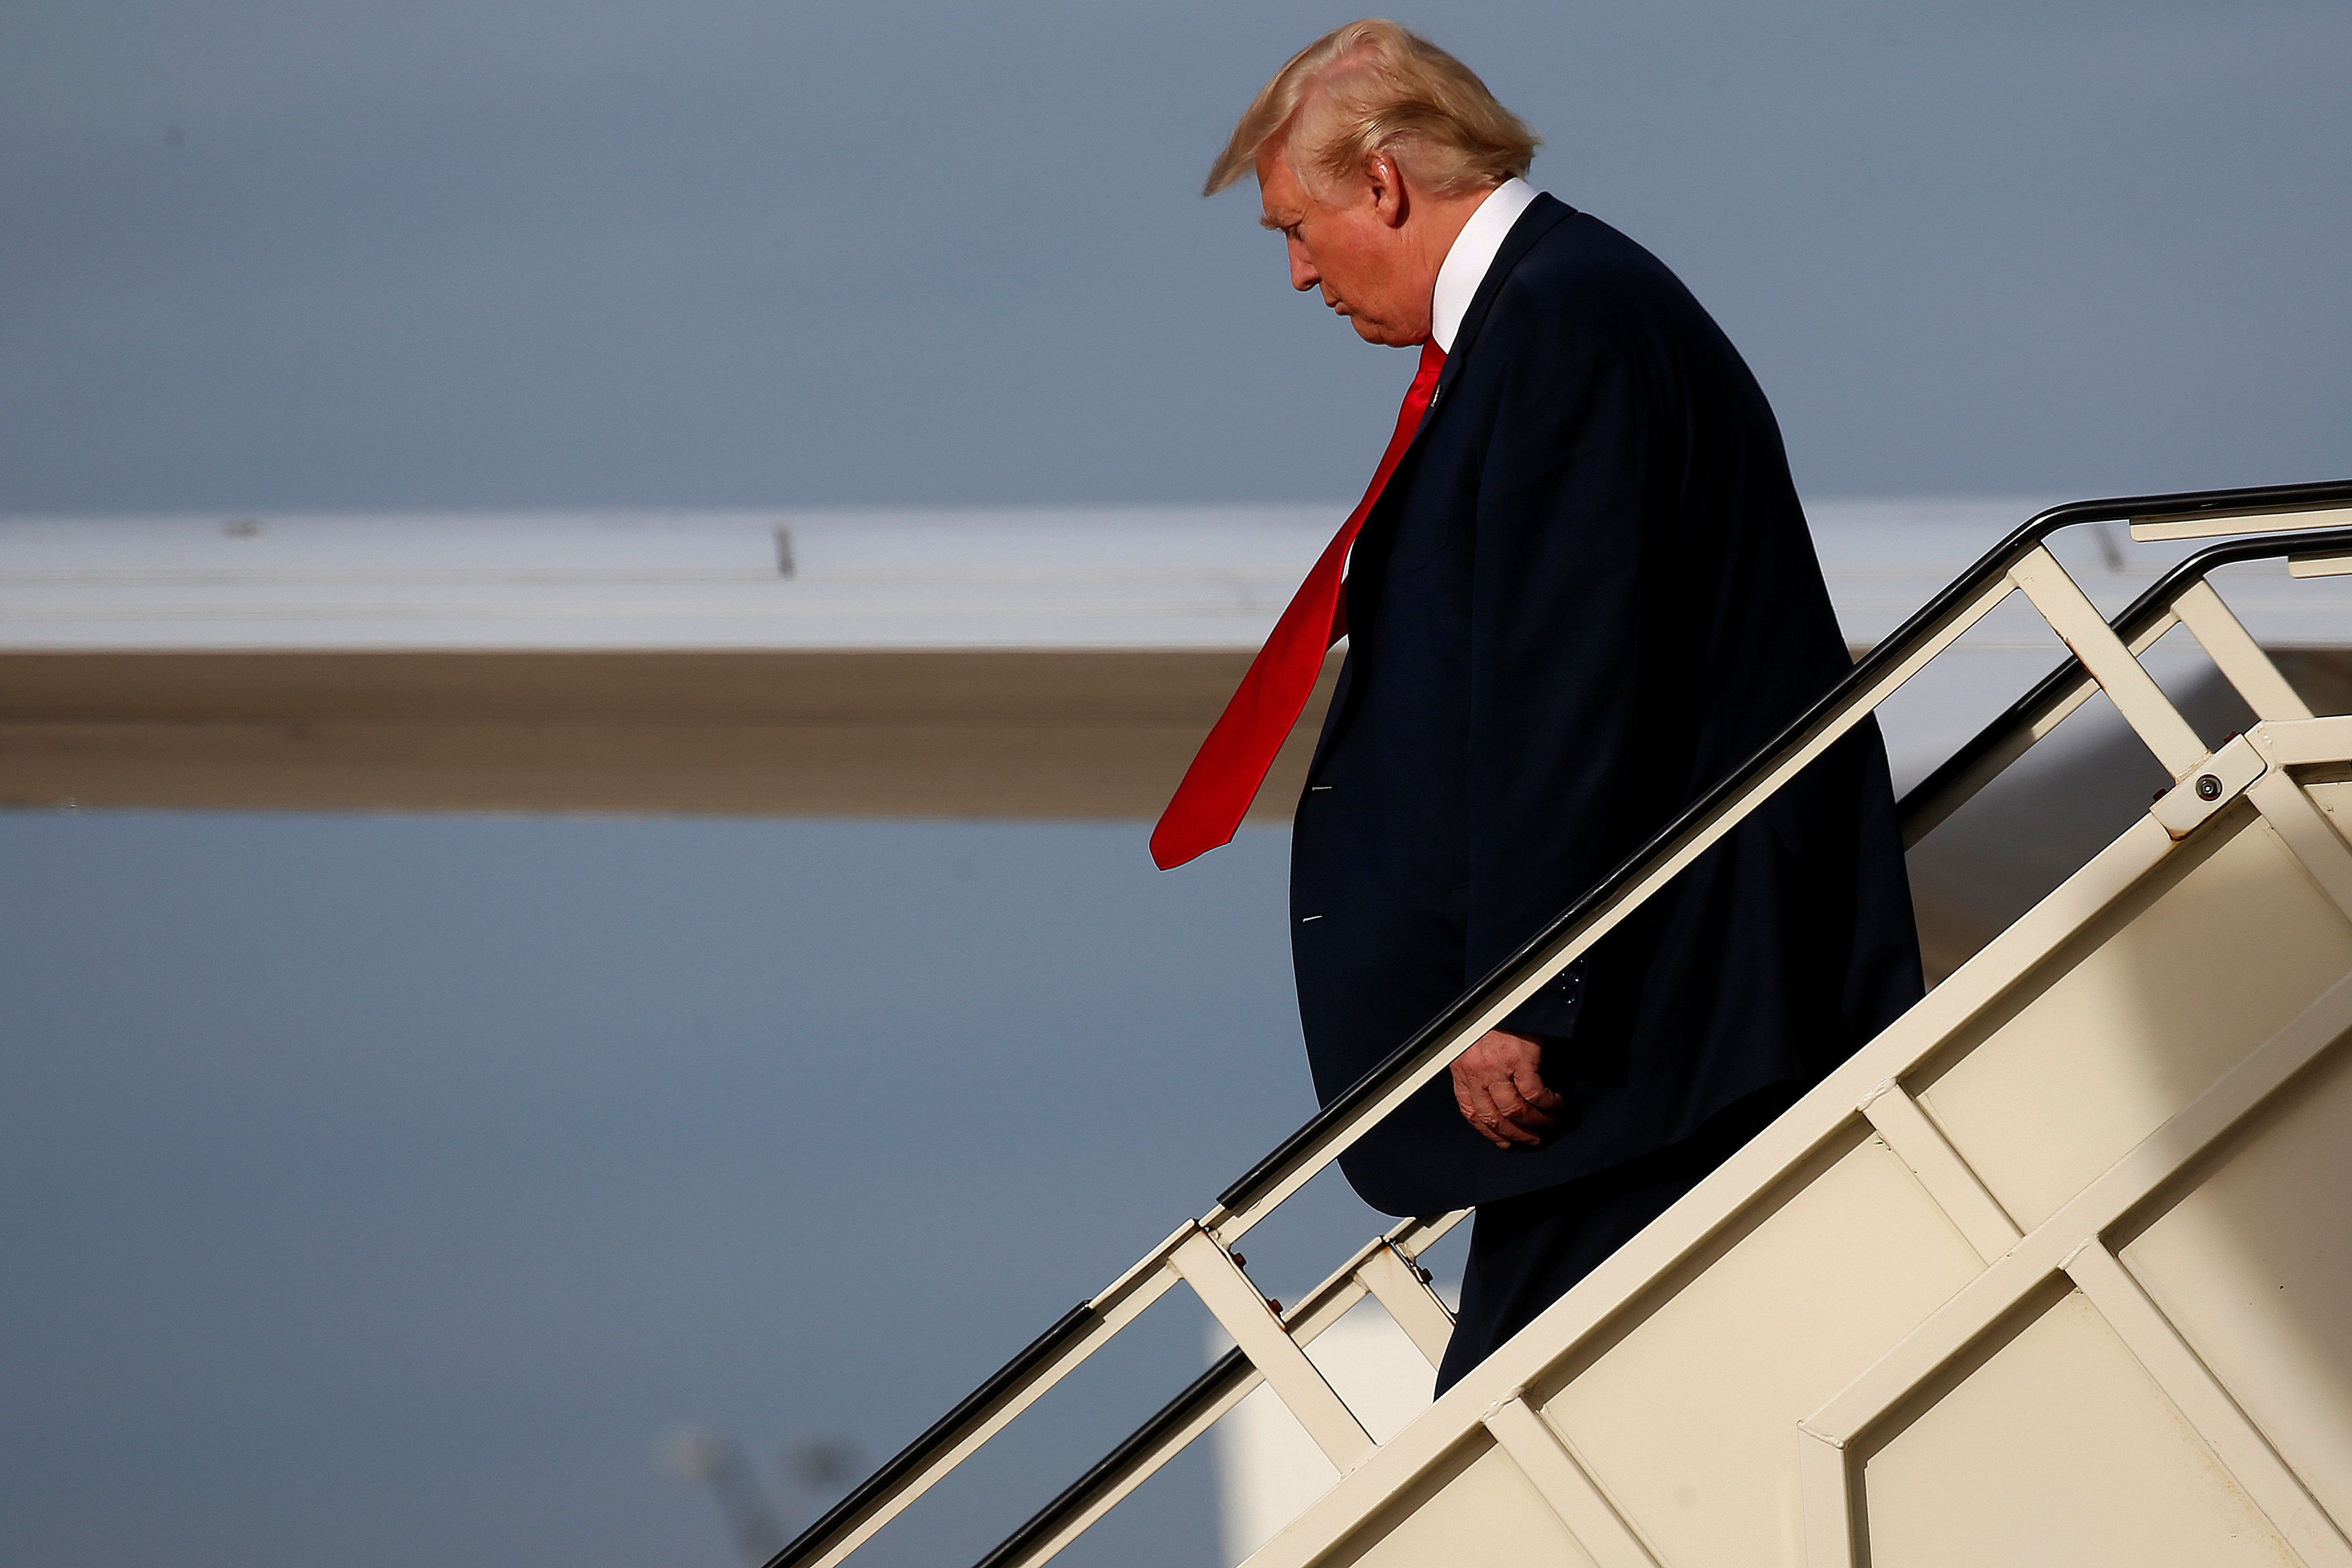 Republican presidential nominee Donald Trump walks down the steps of his airplane in Romulus,  Michigan U.S. October 31, 2016.   REUTERS/Carlo Allegri